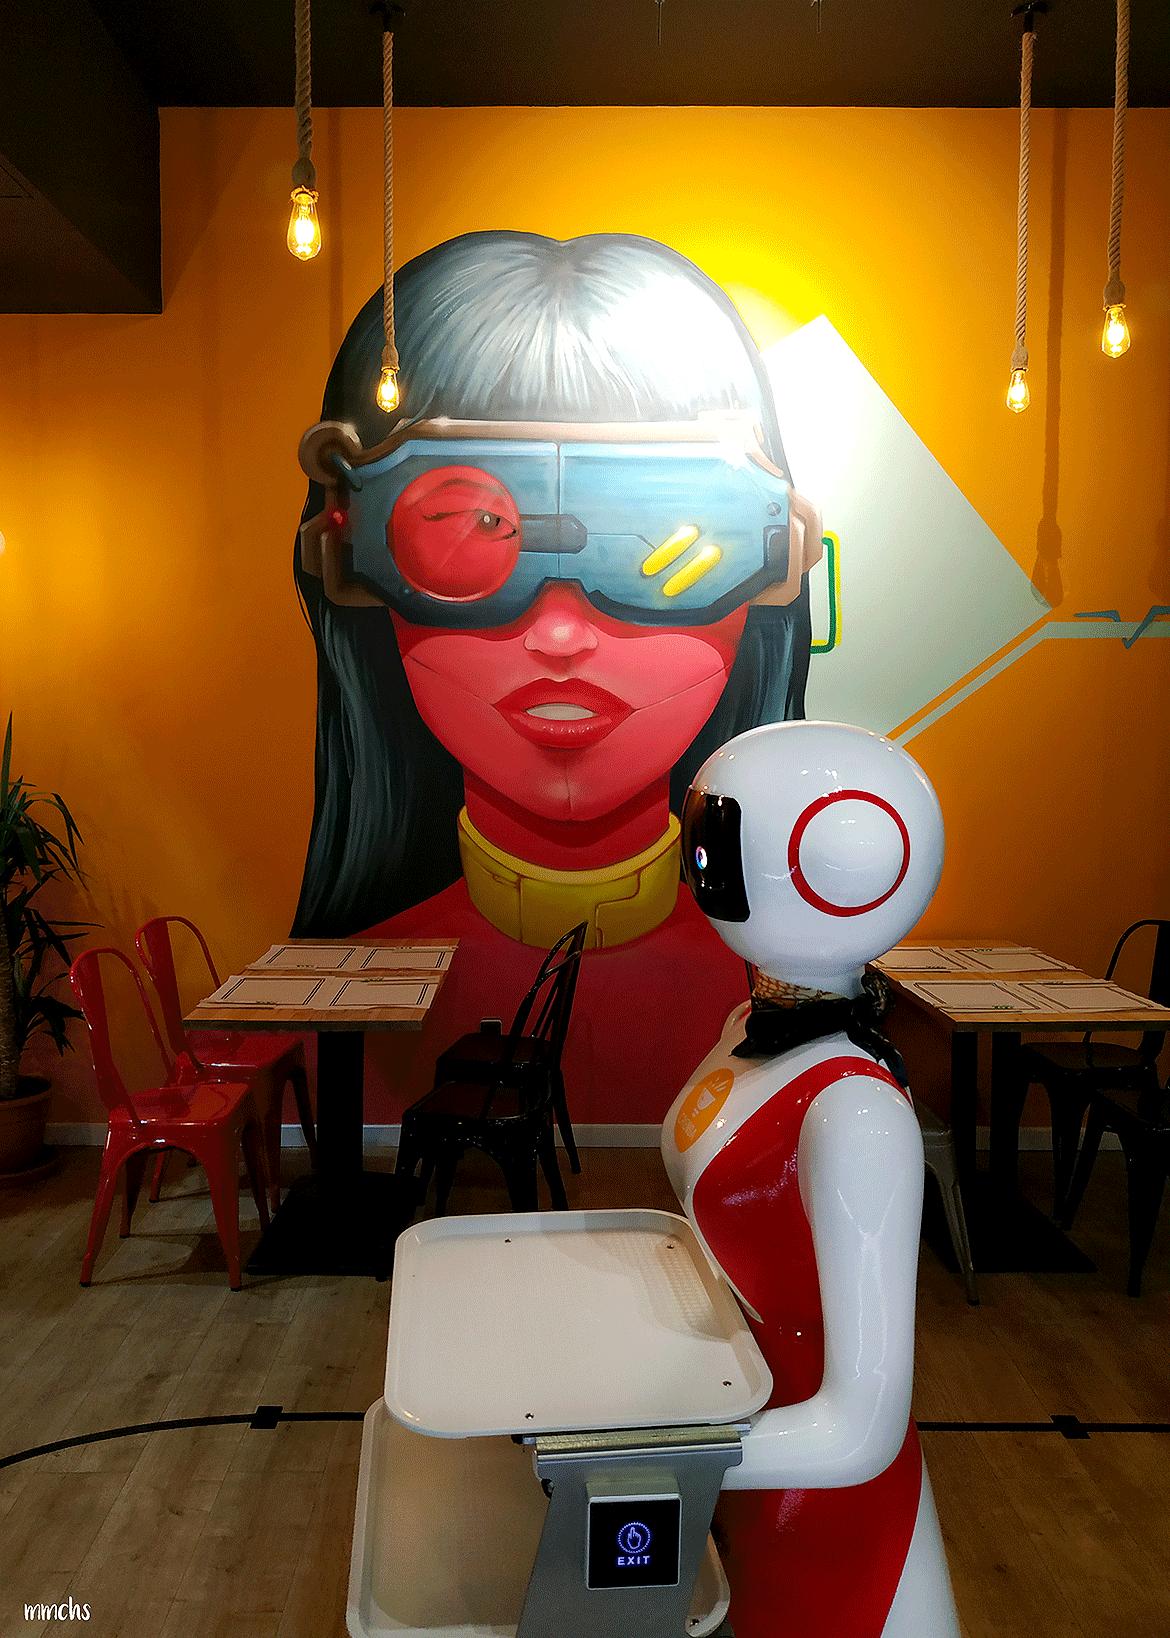 decoración restaurante Crensa Valencia camareros robots